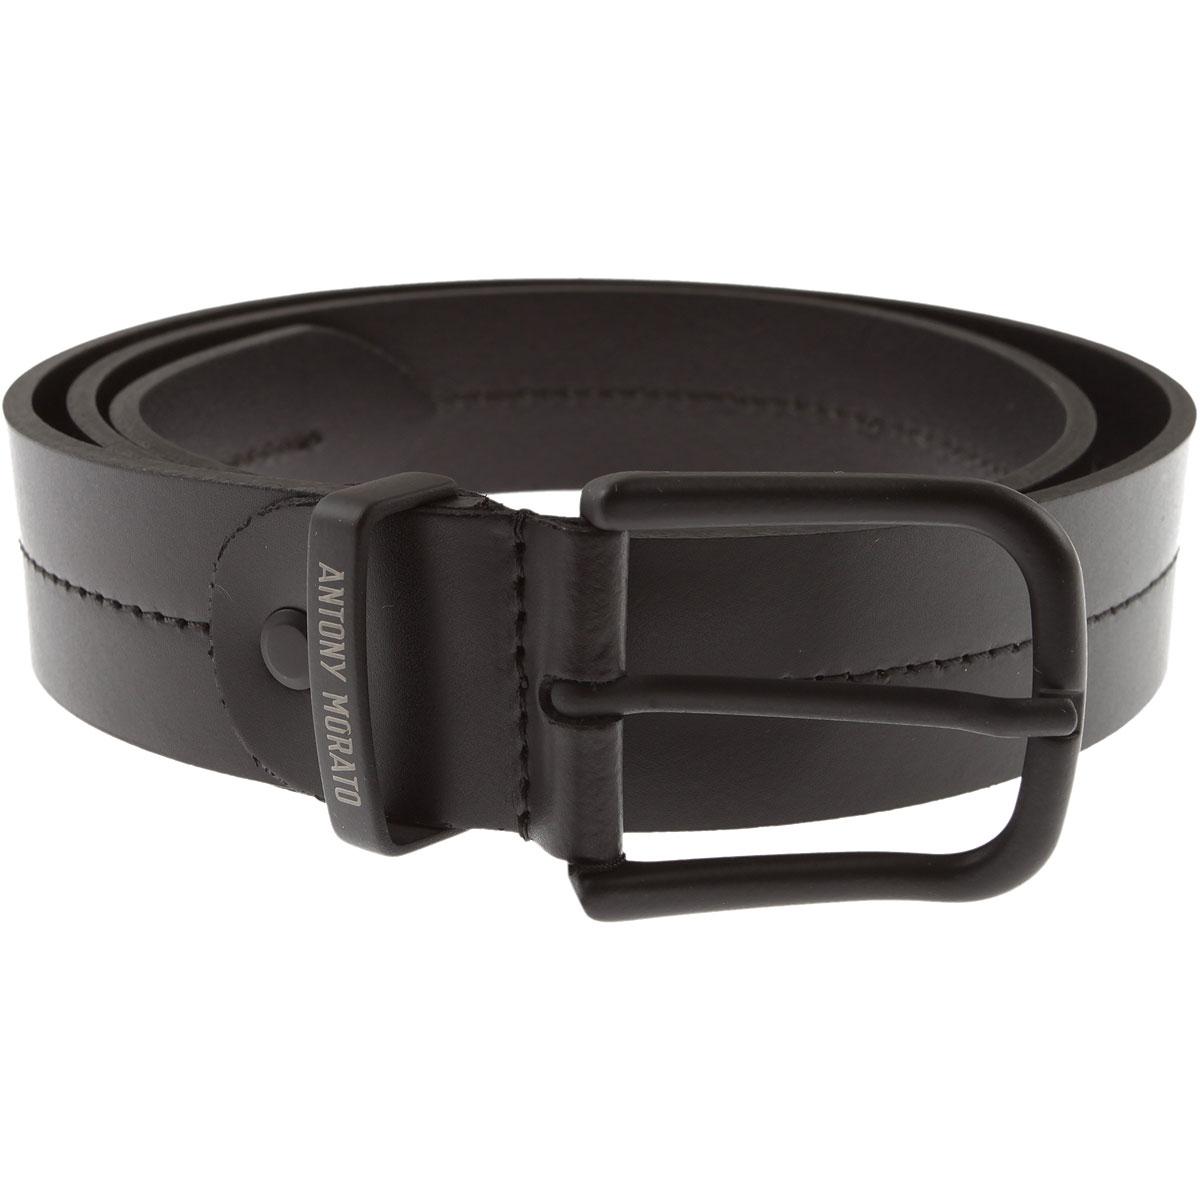 Image of Antony Morato Belts, Black, Leather, 2017, S M L XL